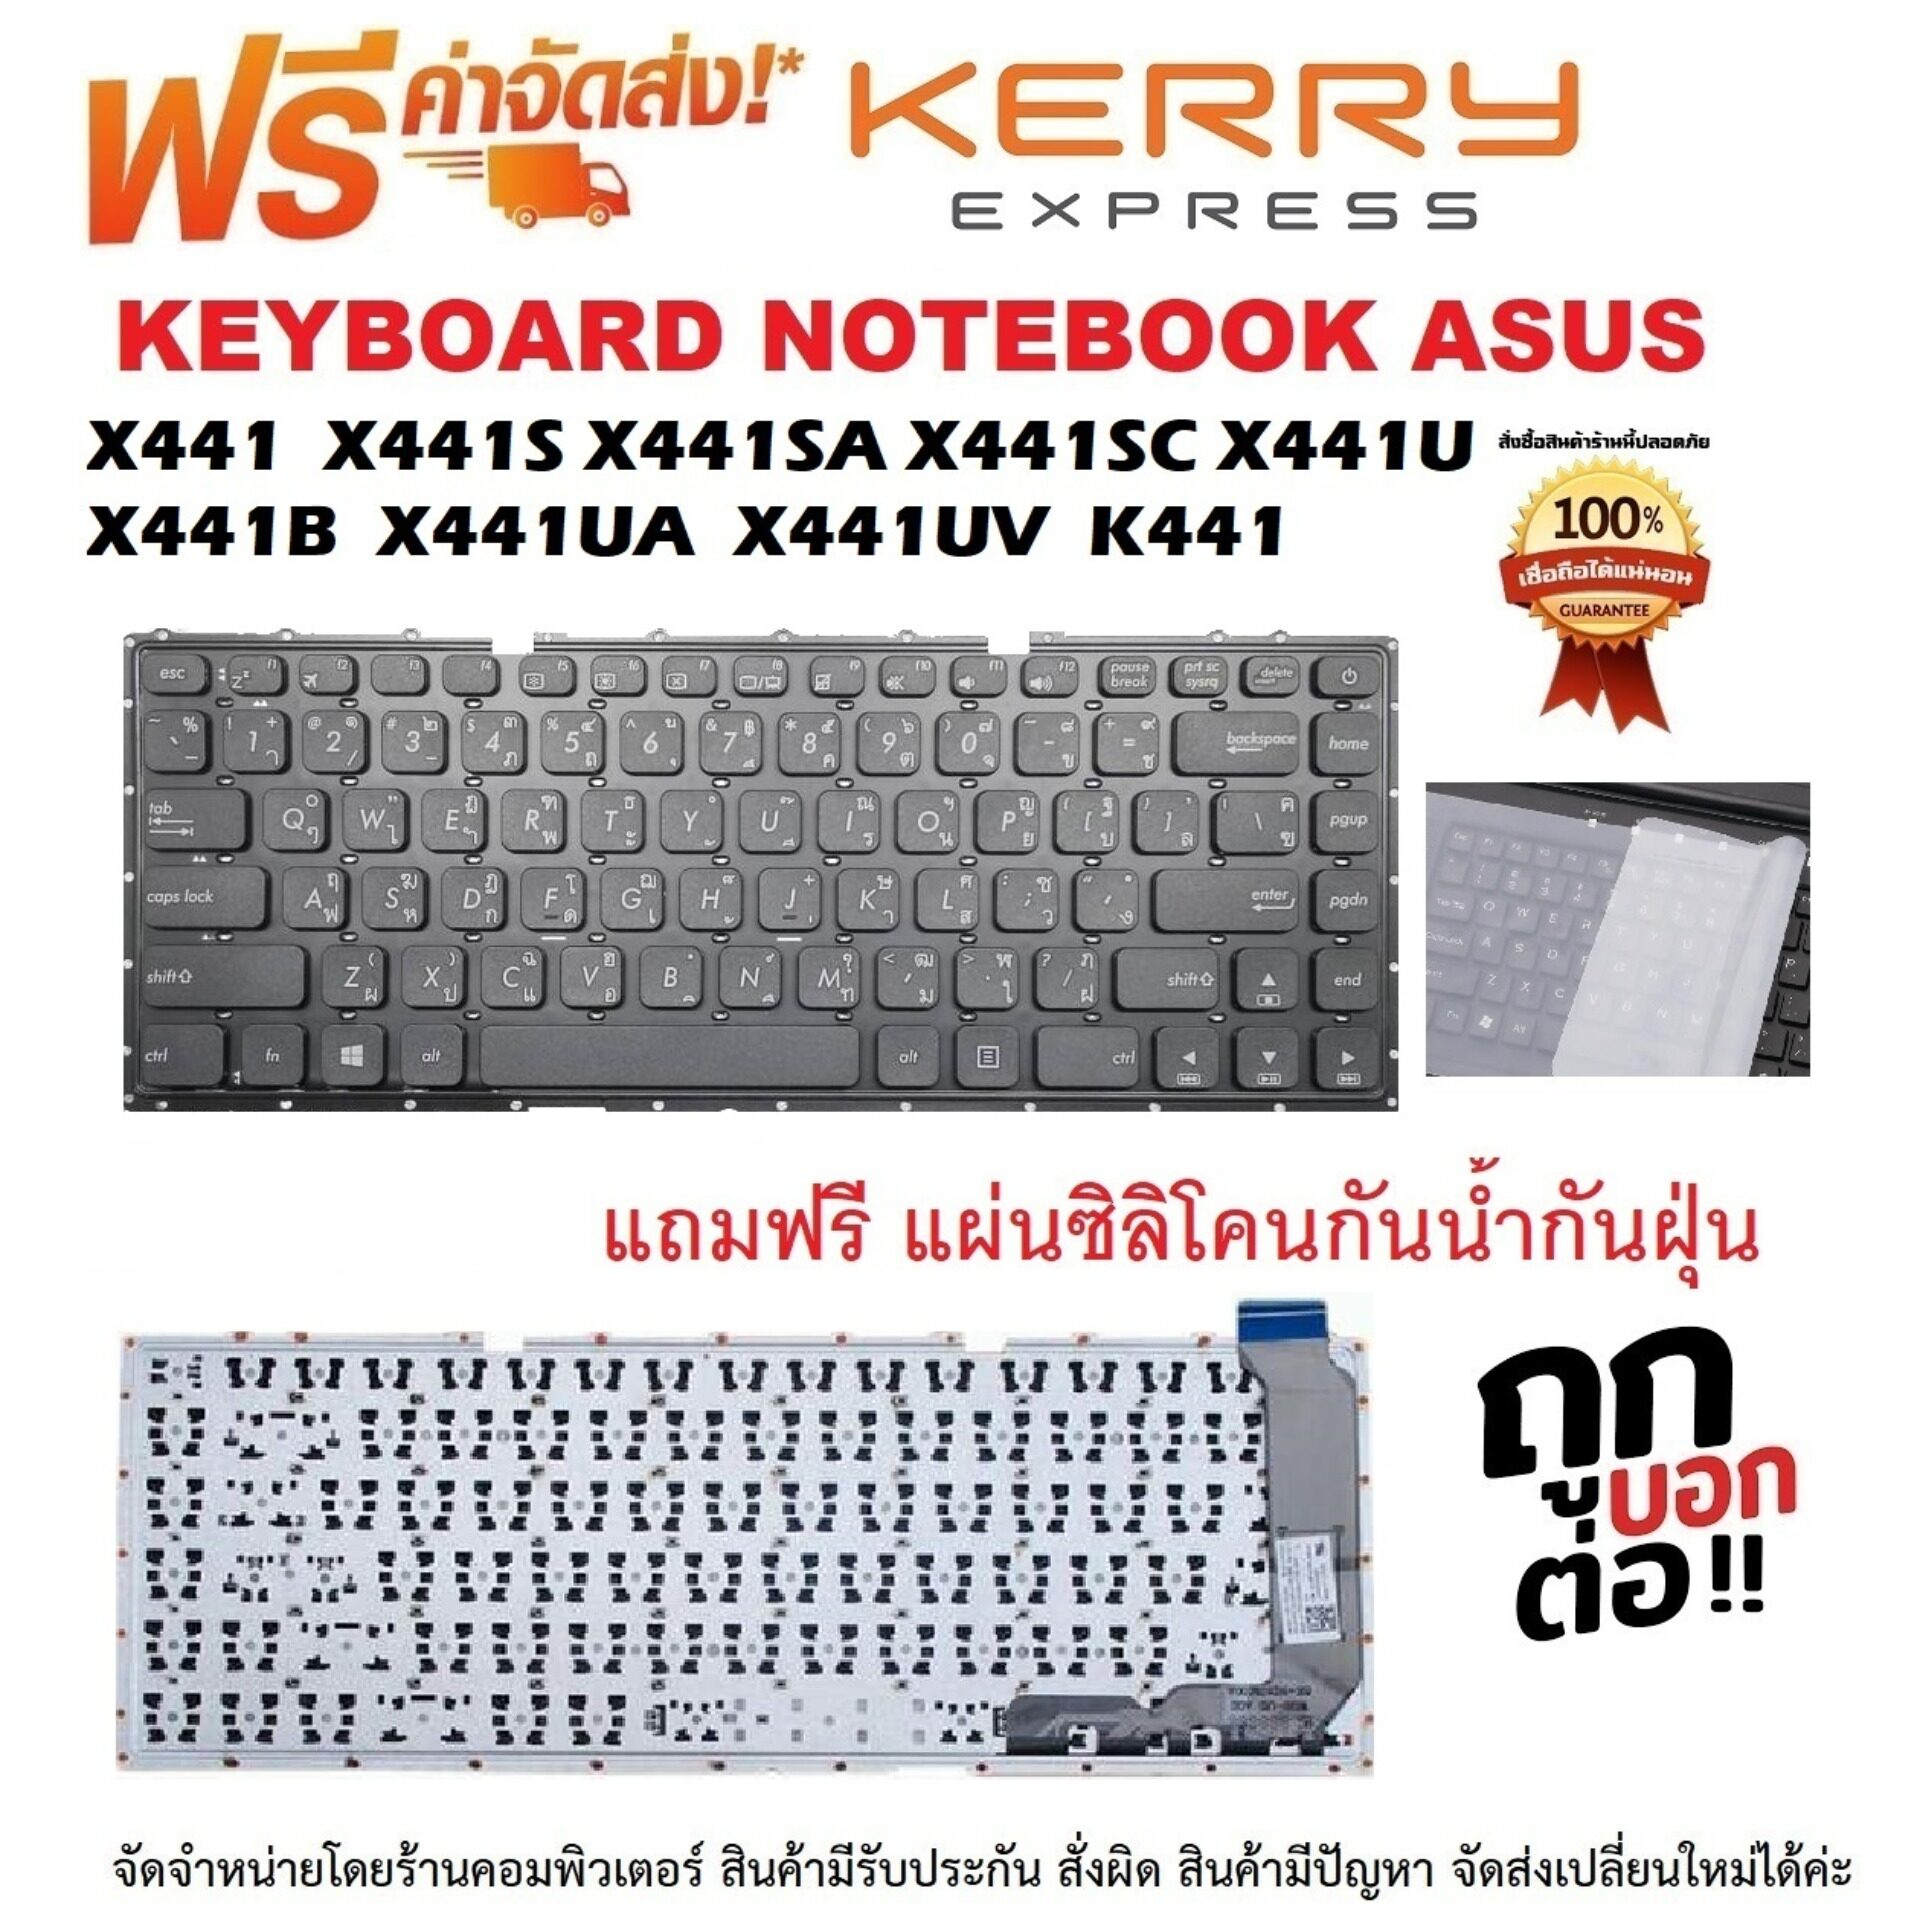 Keyboard Asus คีย์บอร์ดเอซุส X441 X441s X441sa X441sc X441u X441b X441ua X441uv / K441 K441s K441sa K441sc.